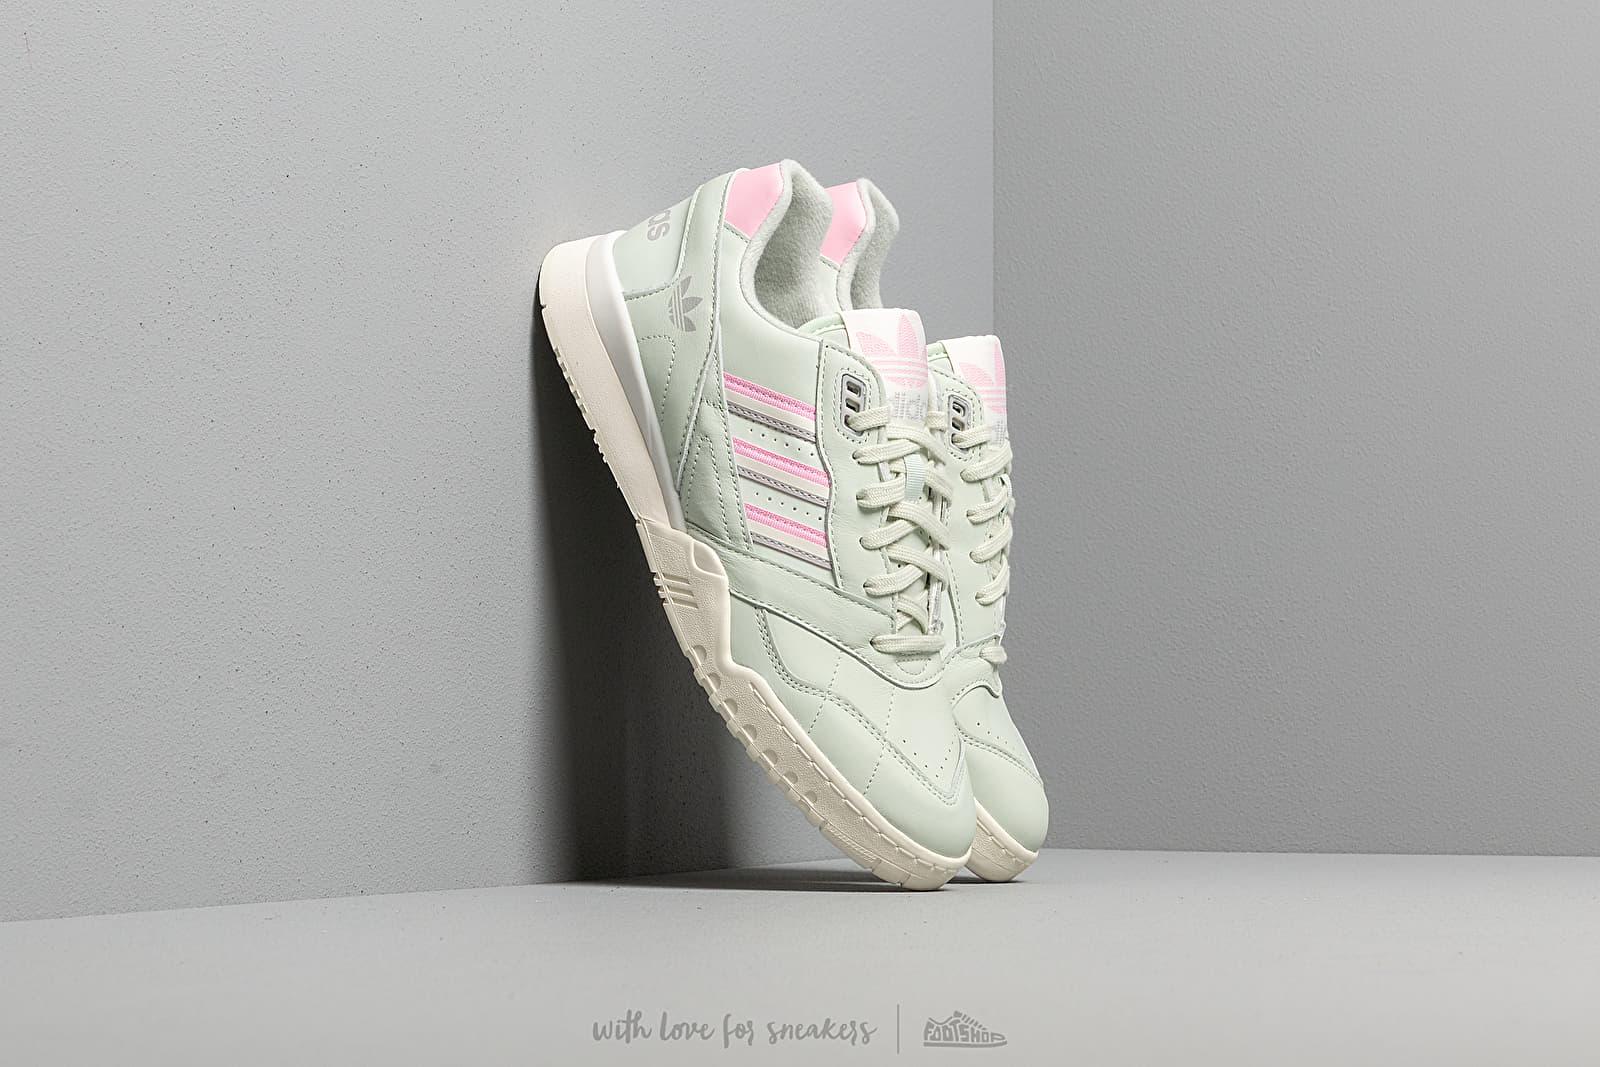 Pánské tenisky a boty adidas A.R. Trainer Linen Green/ True Pink/ Off White